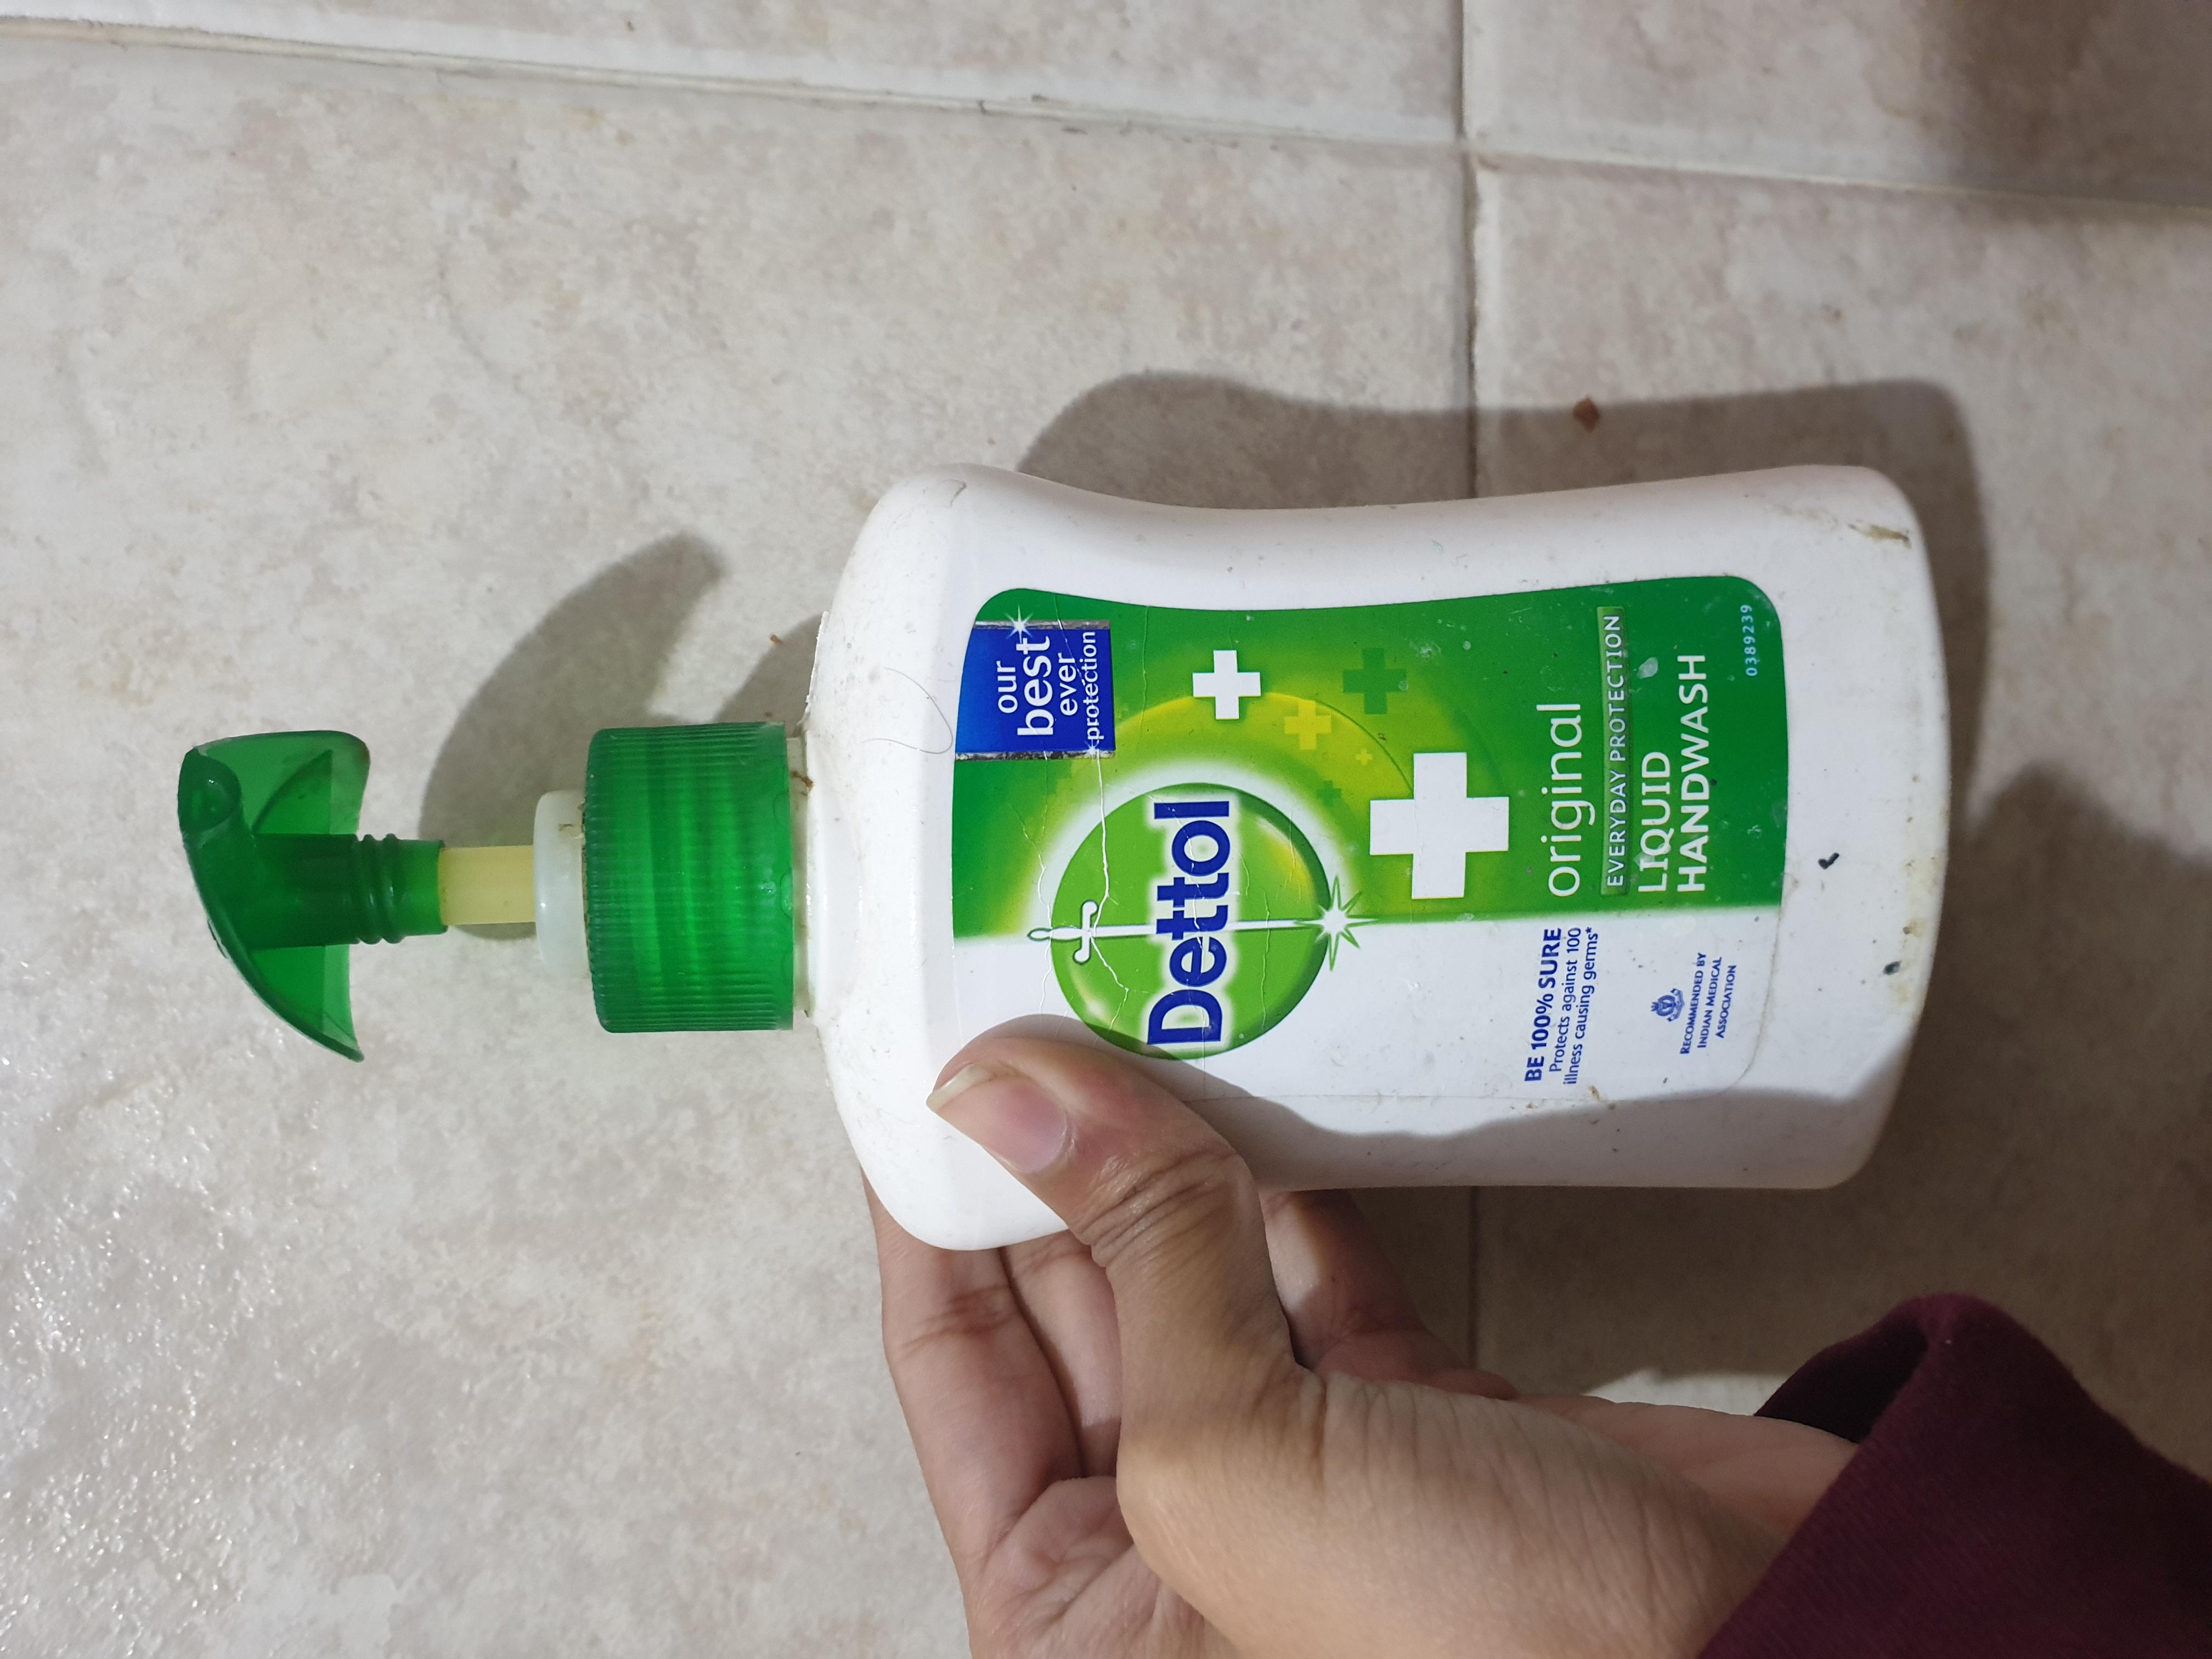 Dettol Original Liquid Hand Wash-Most effective hand wash-By vitika_singh